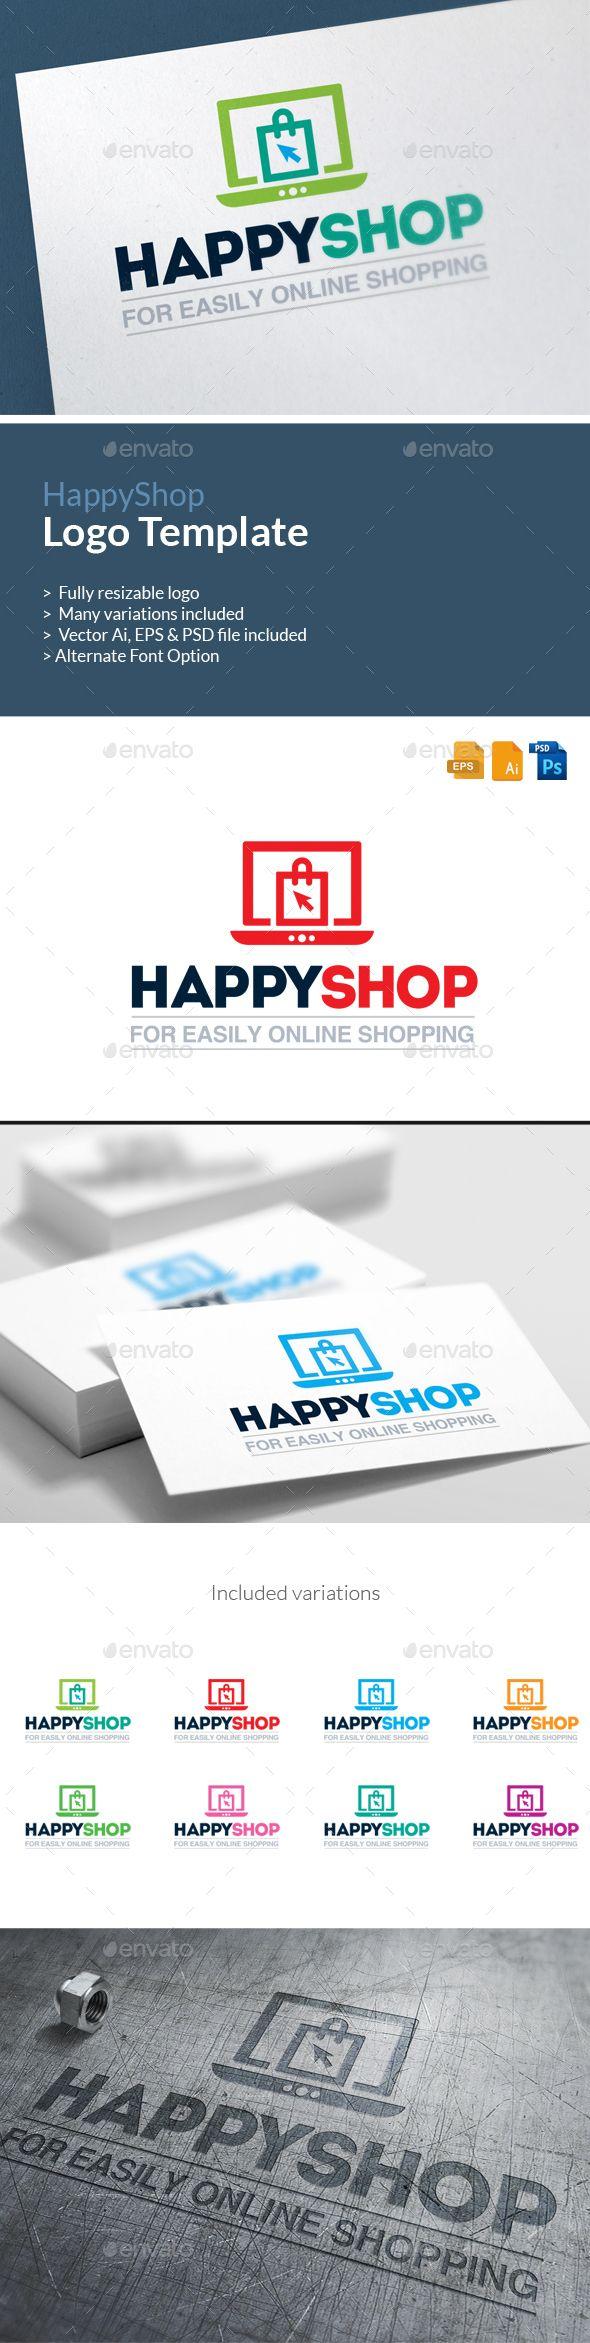 E-Commerce Logo Happy Shop Logo   PSD Template • Download ↓ https://graphicriver.net/item/ecommerce-logo-happy-shop-logo-template/13933858?ref=pxcr